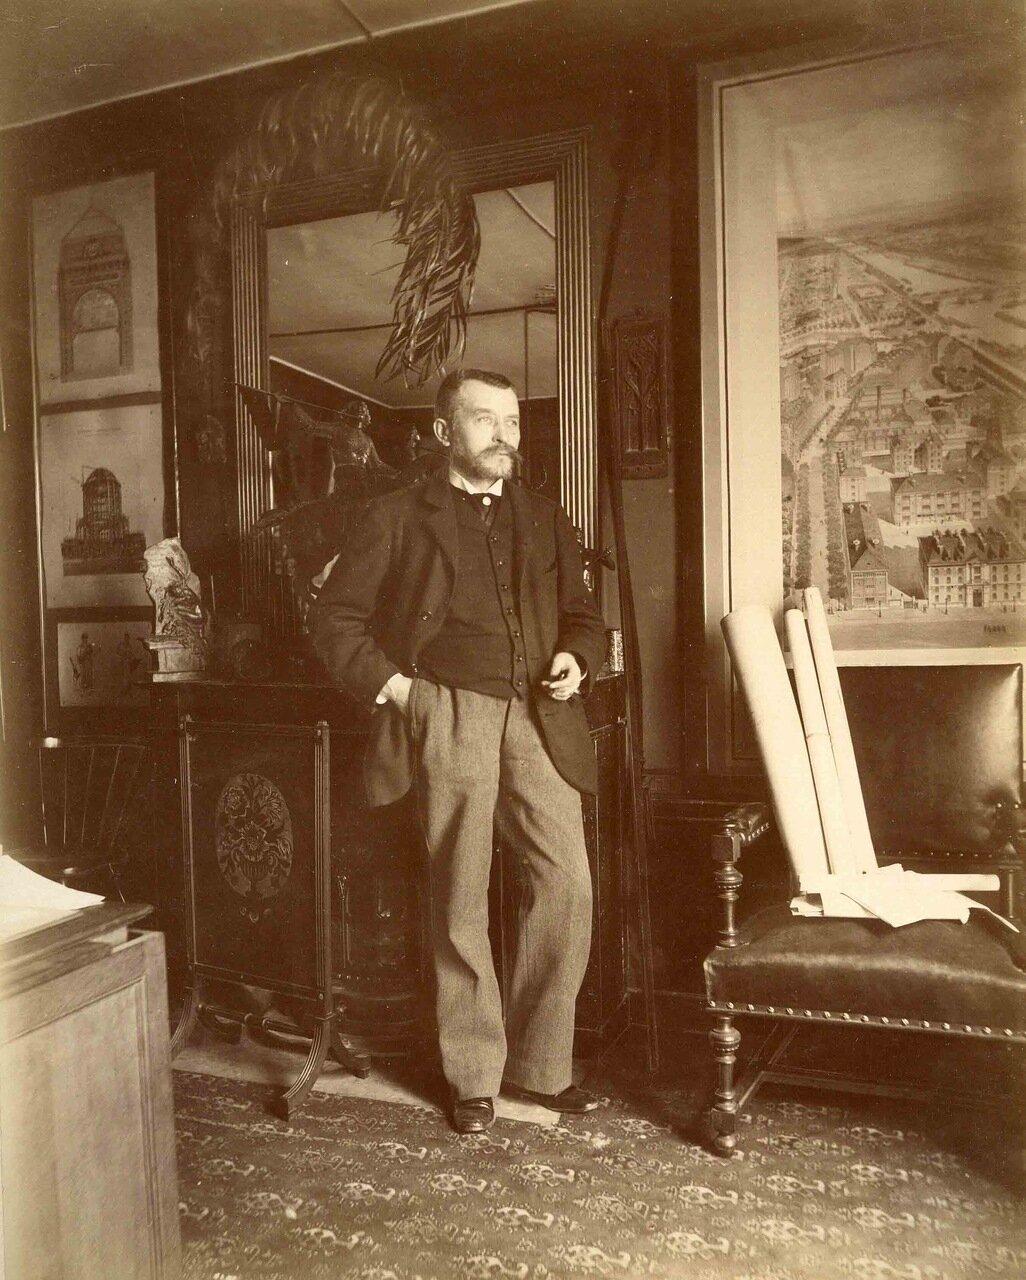 Жозеф-Антуан Бувар (1840 - 1920), архитектор